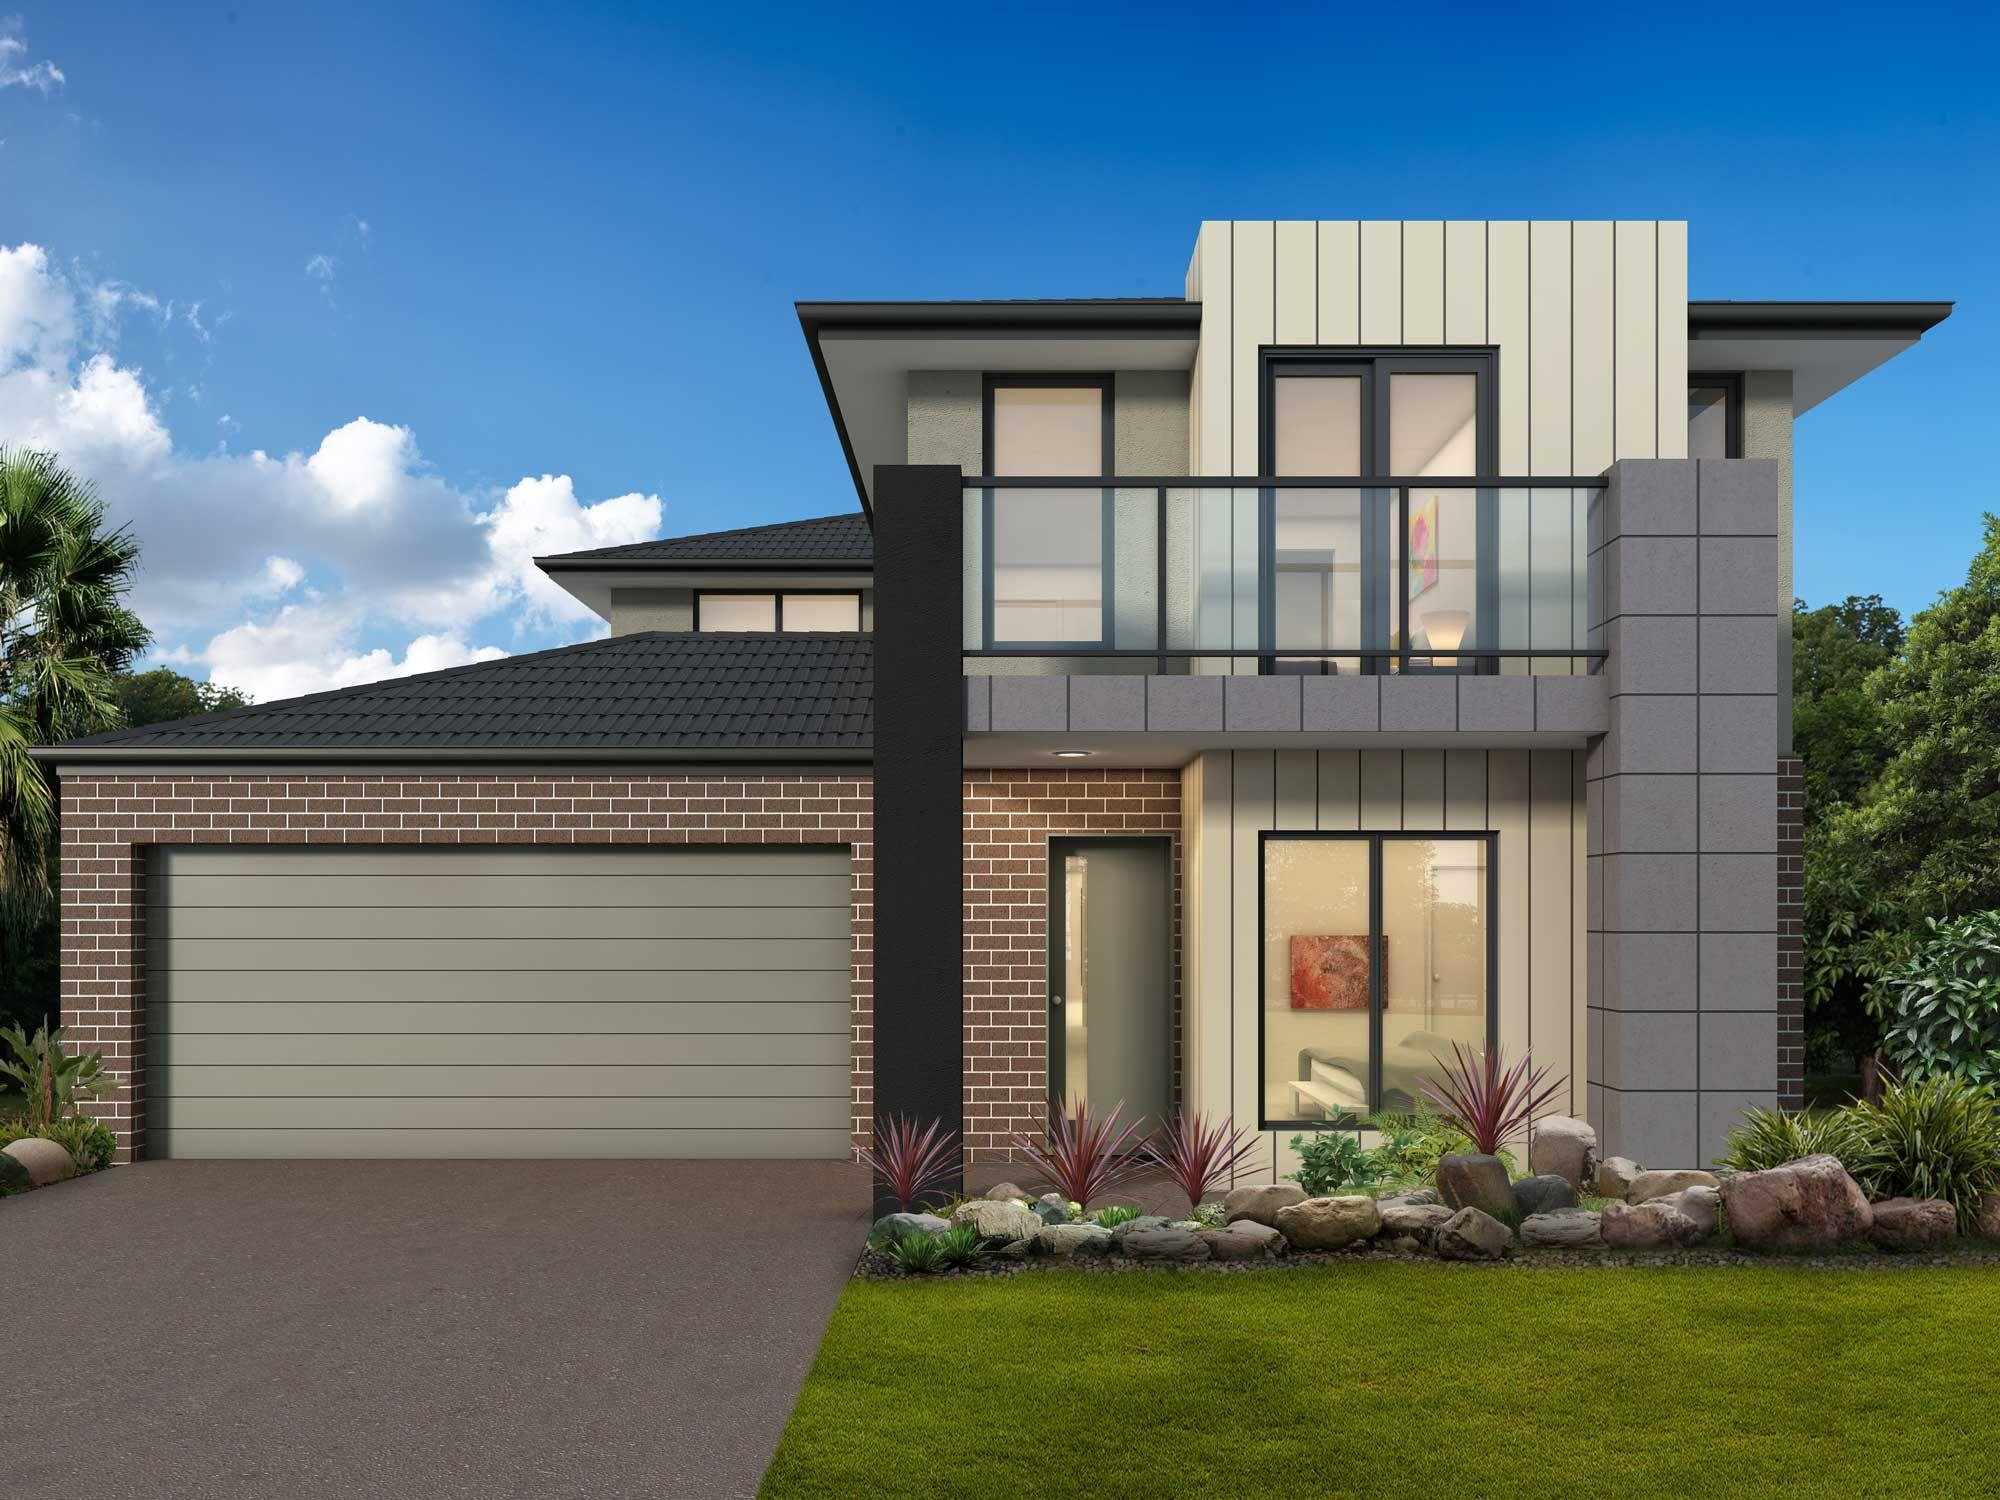 House Designs Melbourne & Geelong House design, House